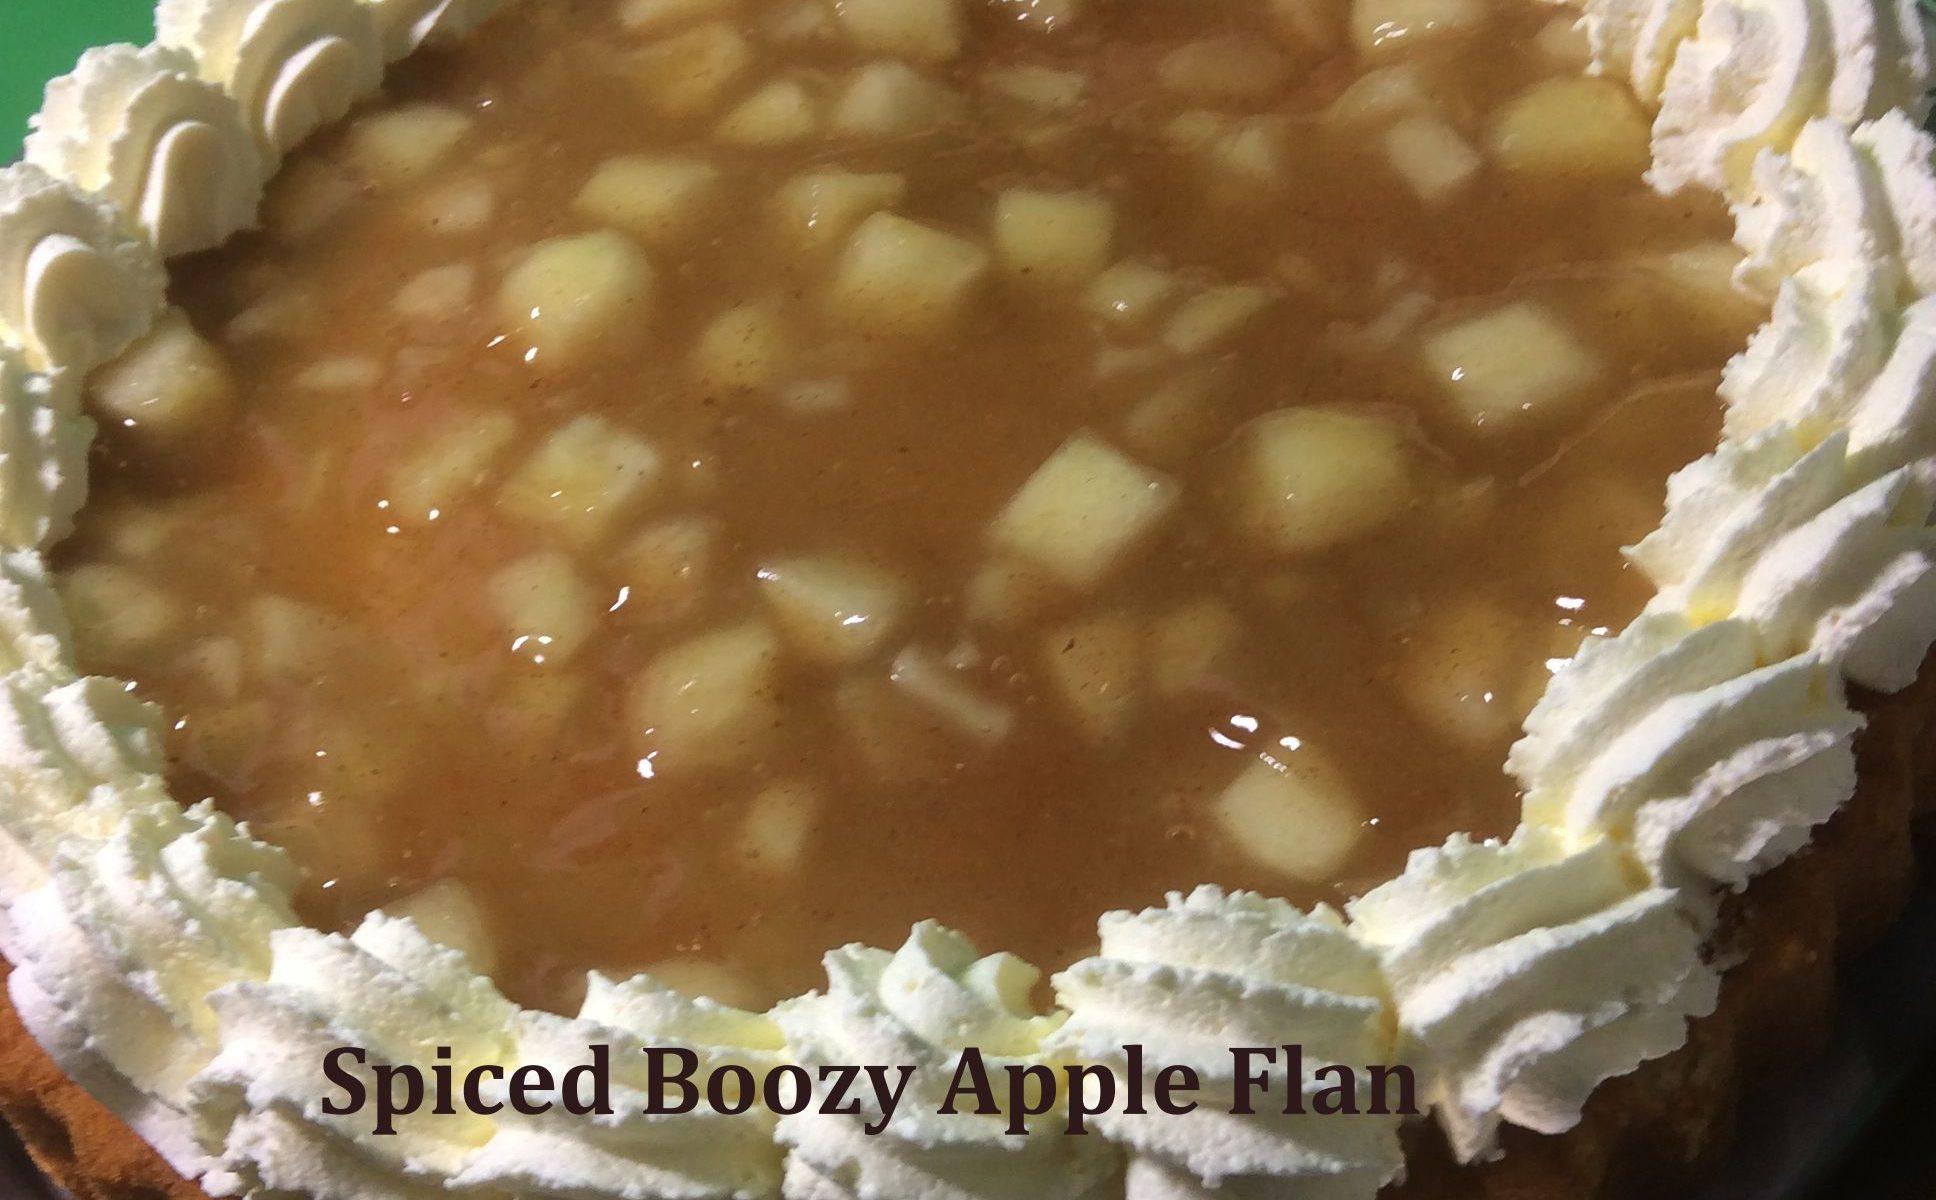 spiced-boozy-apple-flan